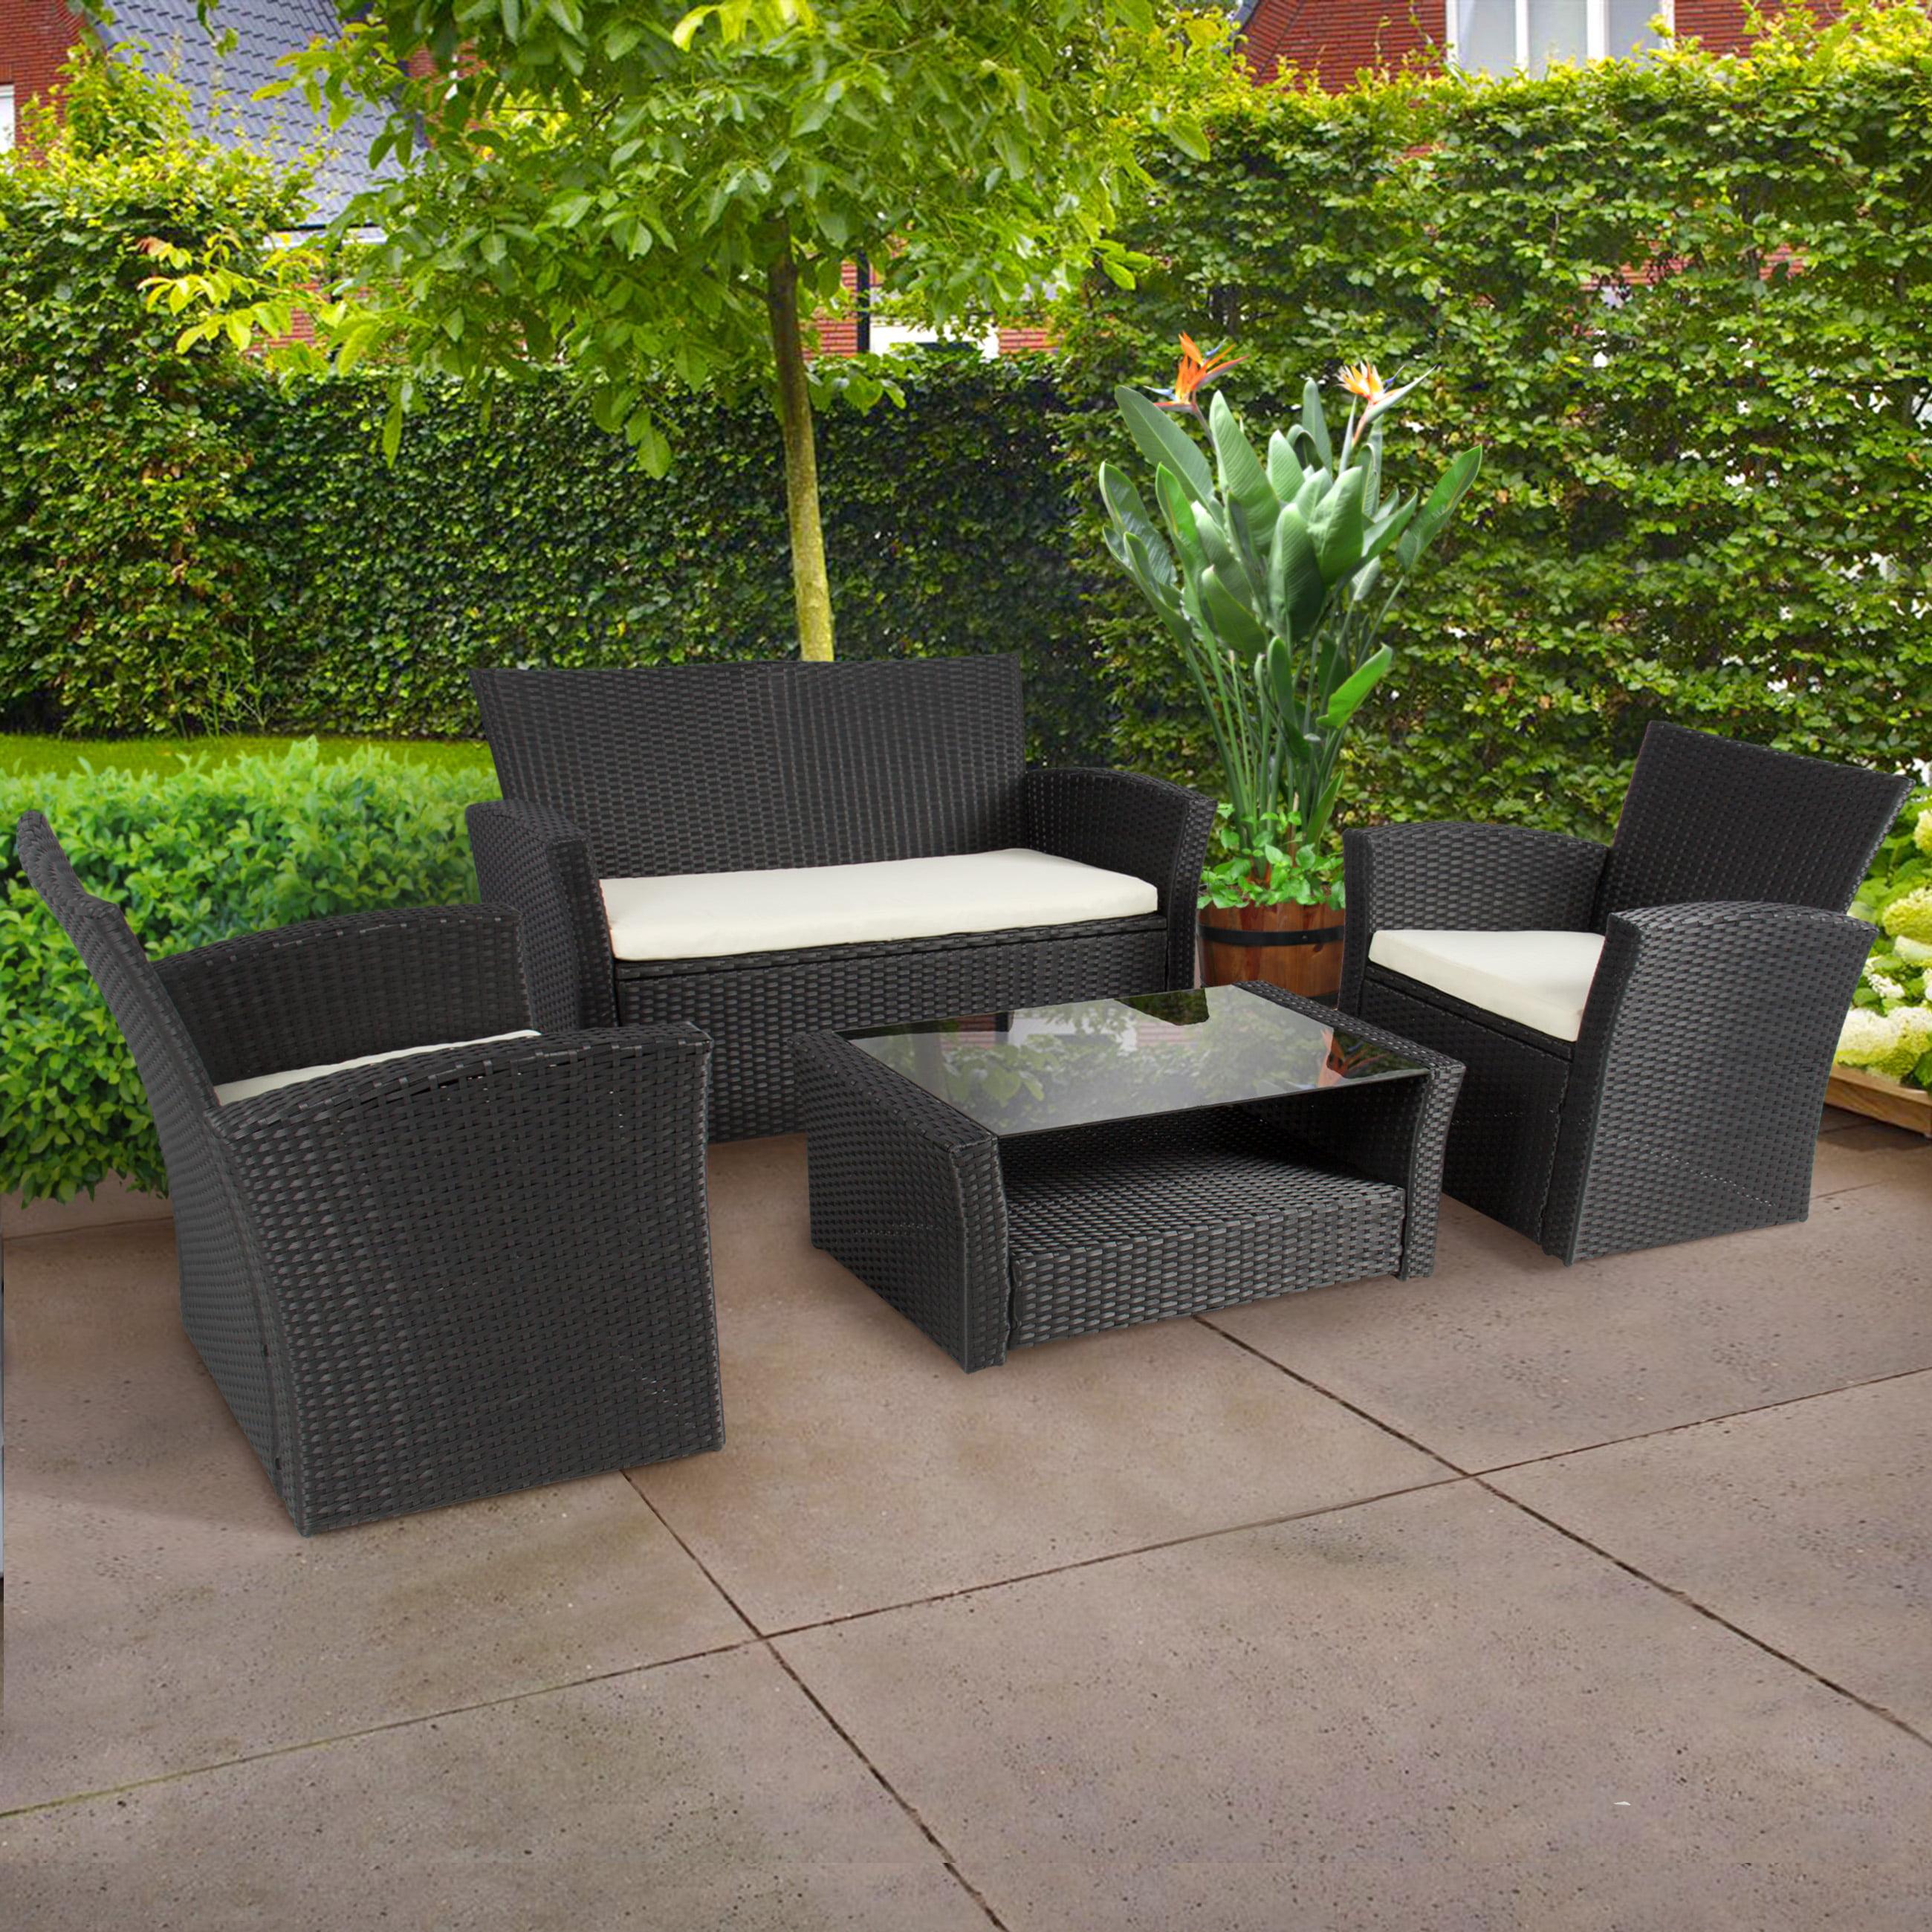 4pc Outdoor Patio Garden Furniture Wicker Rattan Sofa Set...